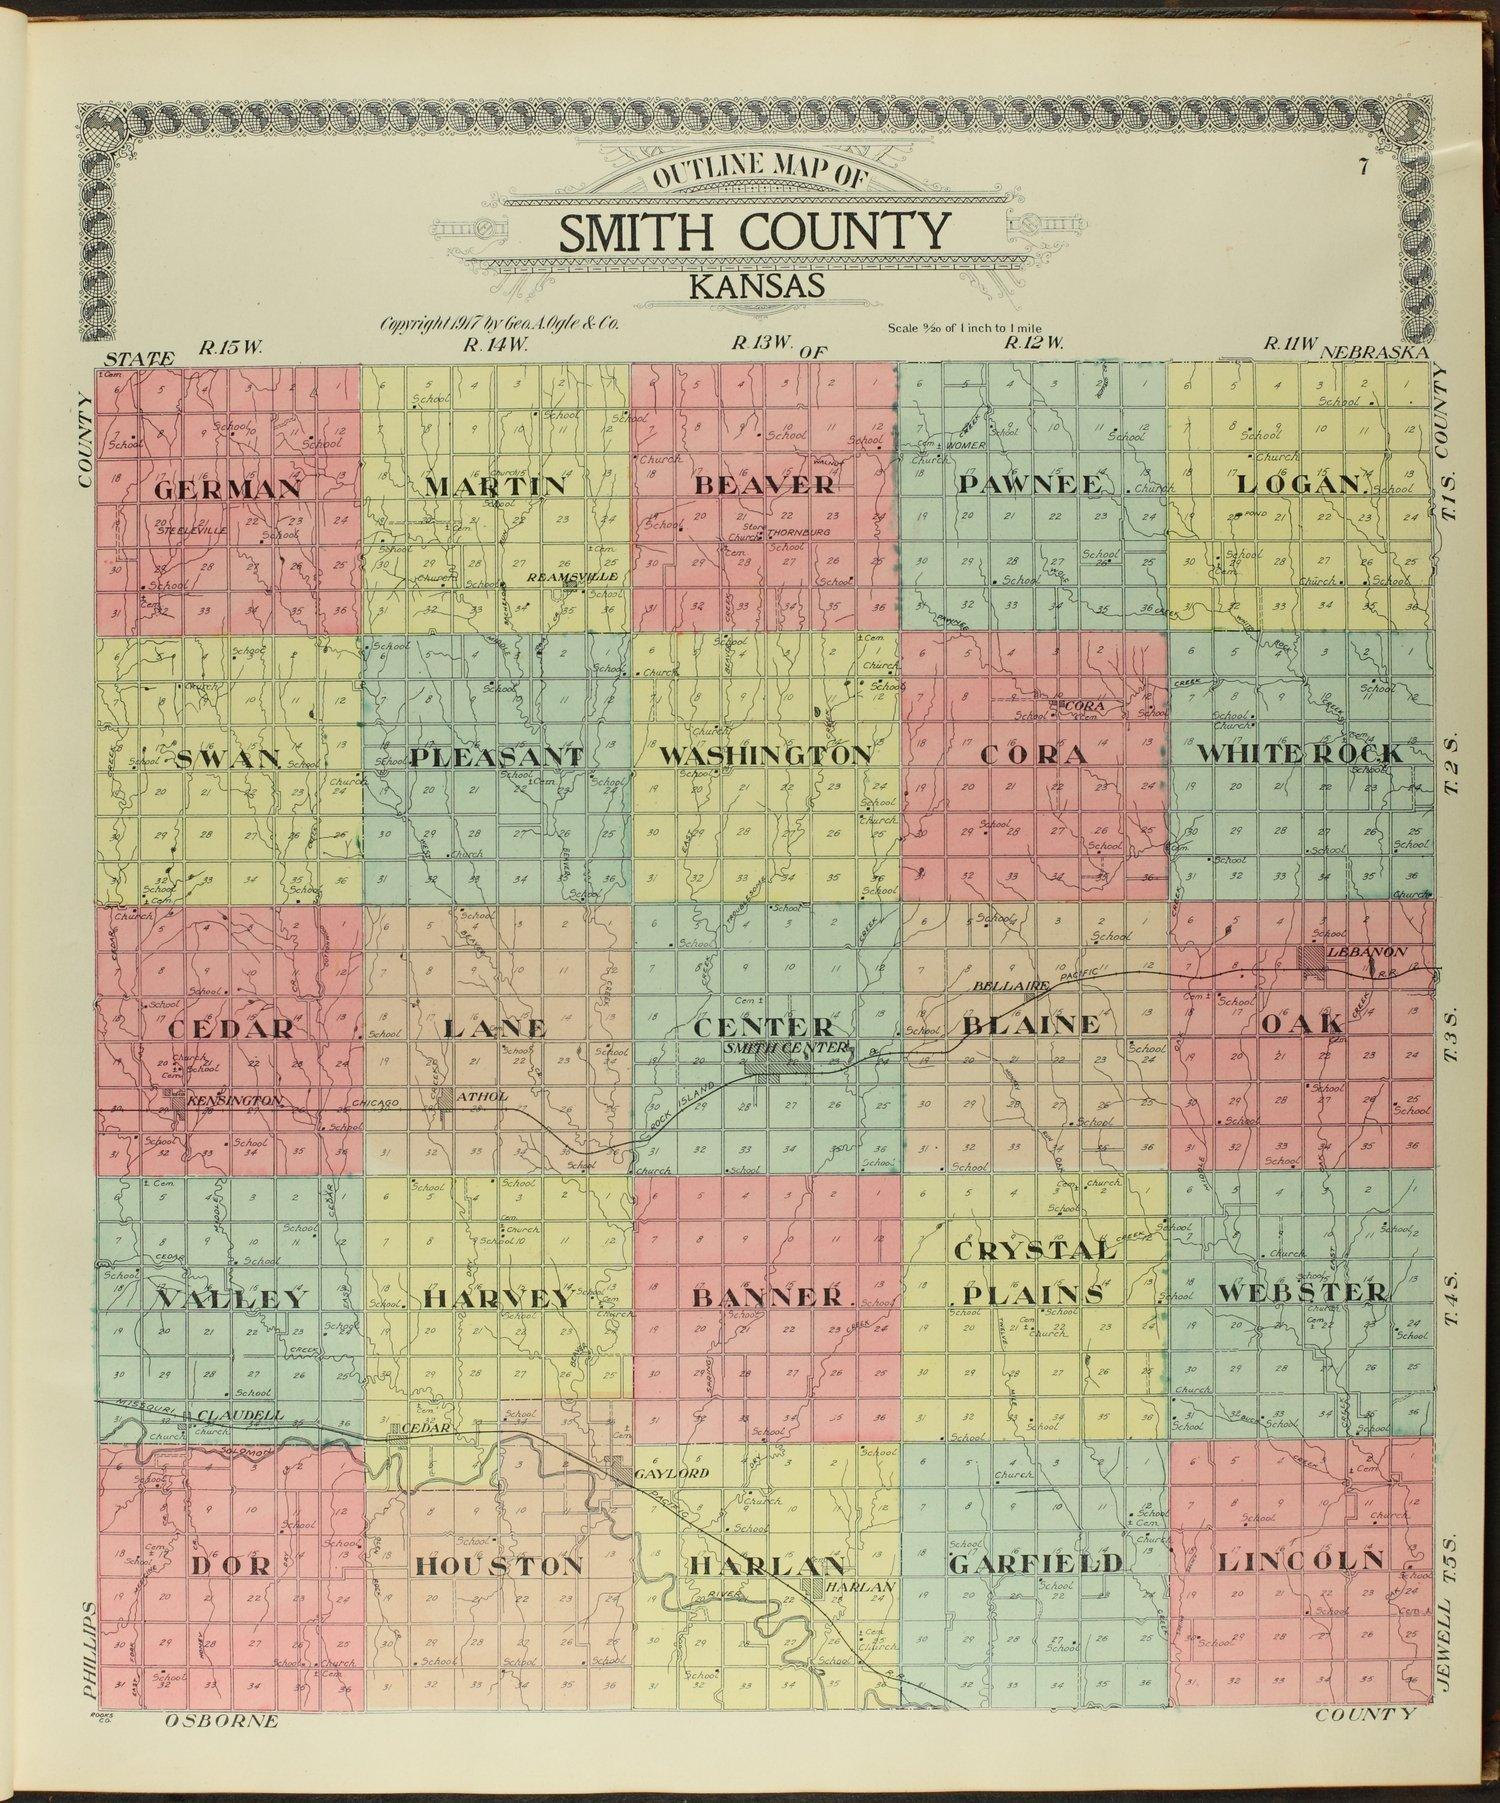 Standard atlas of Smith County, Kansas - 7